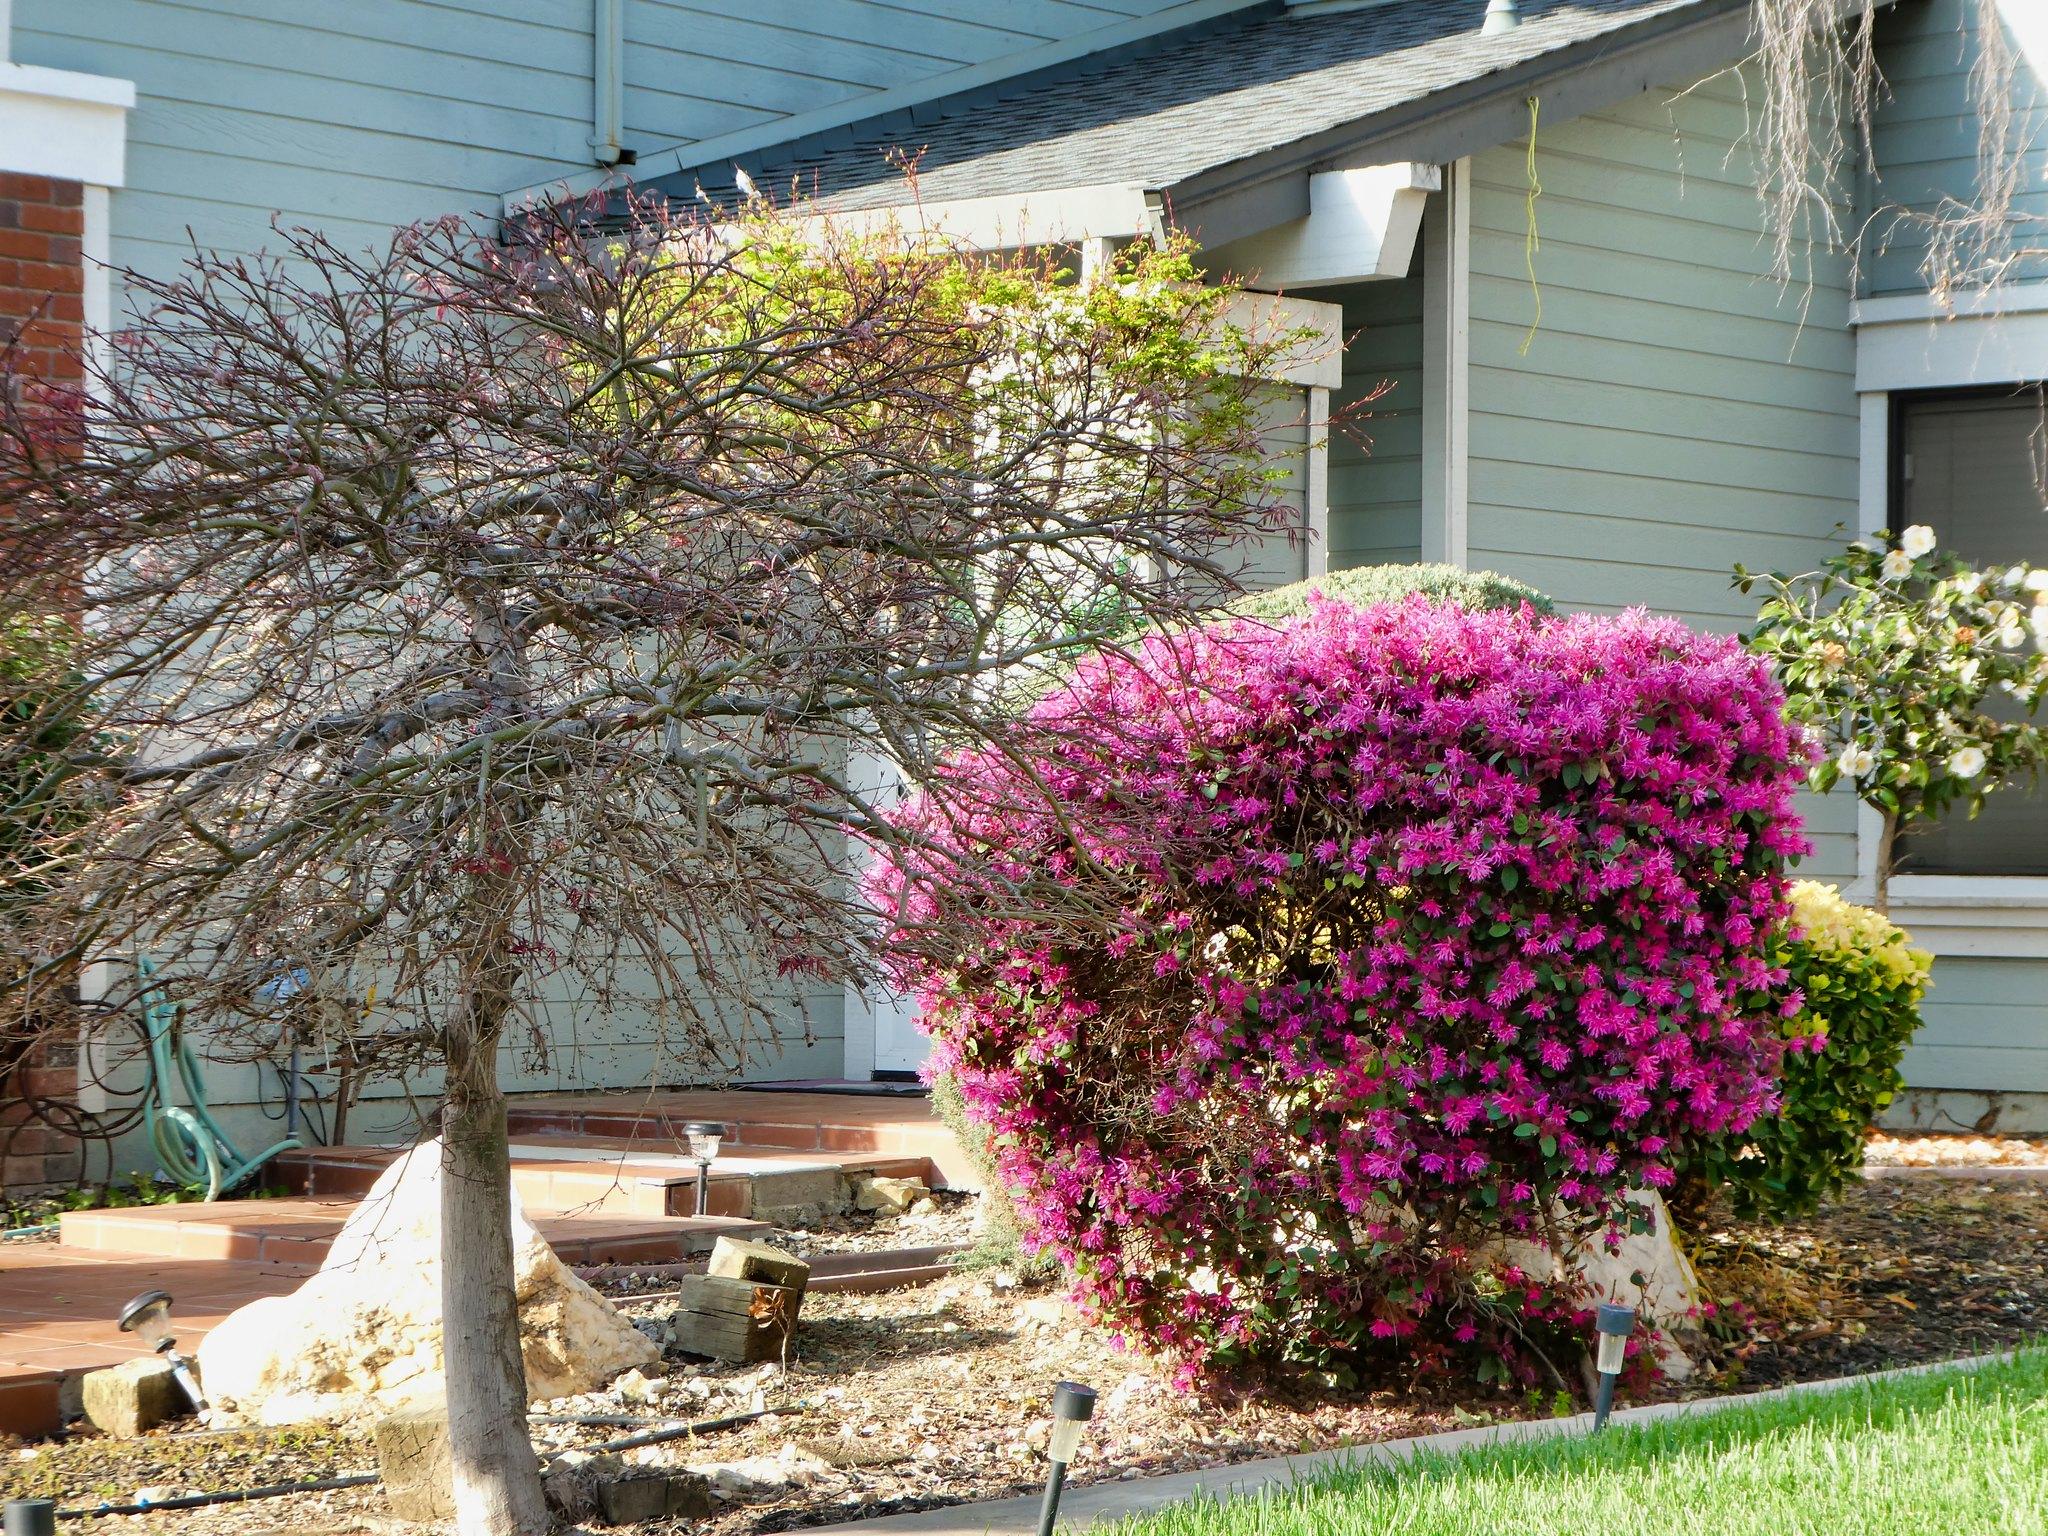 2019-03-19 - Nature Photography - Plants - Frontyards